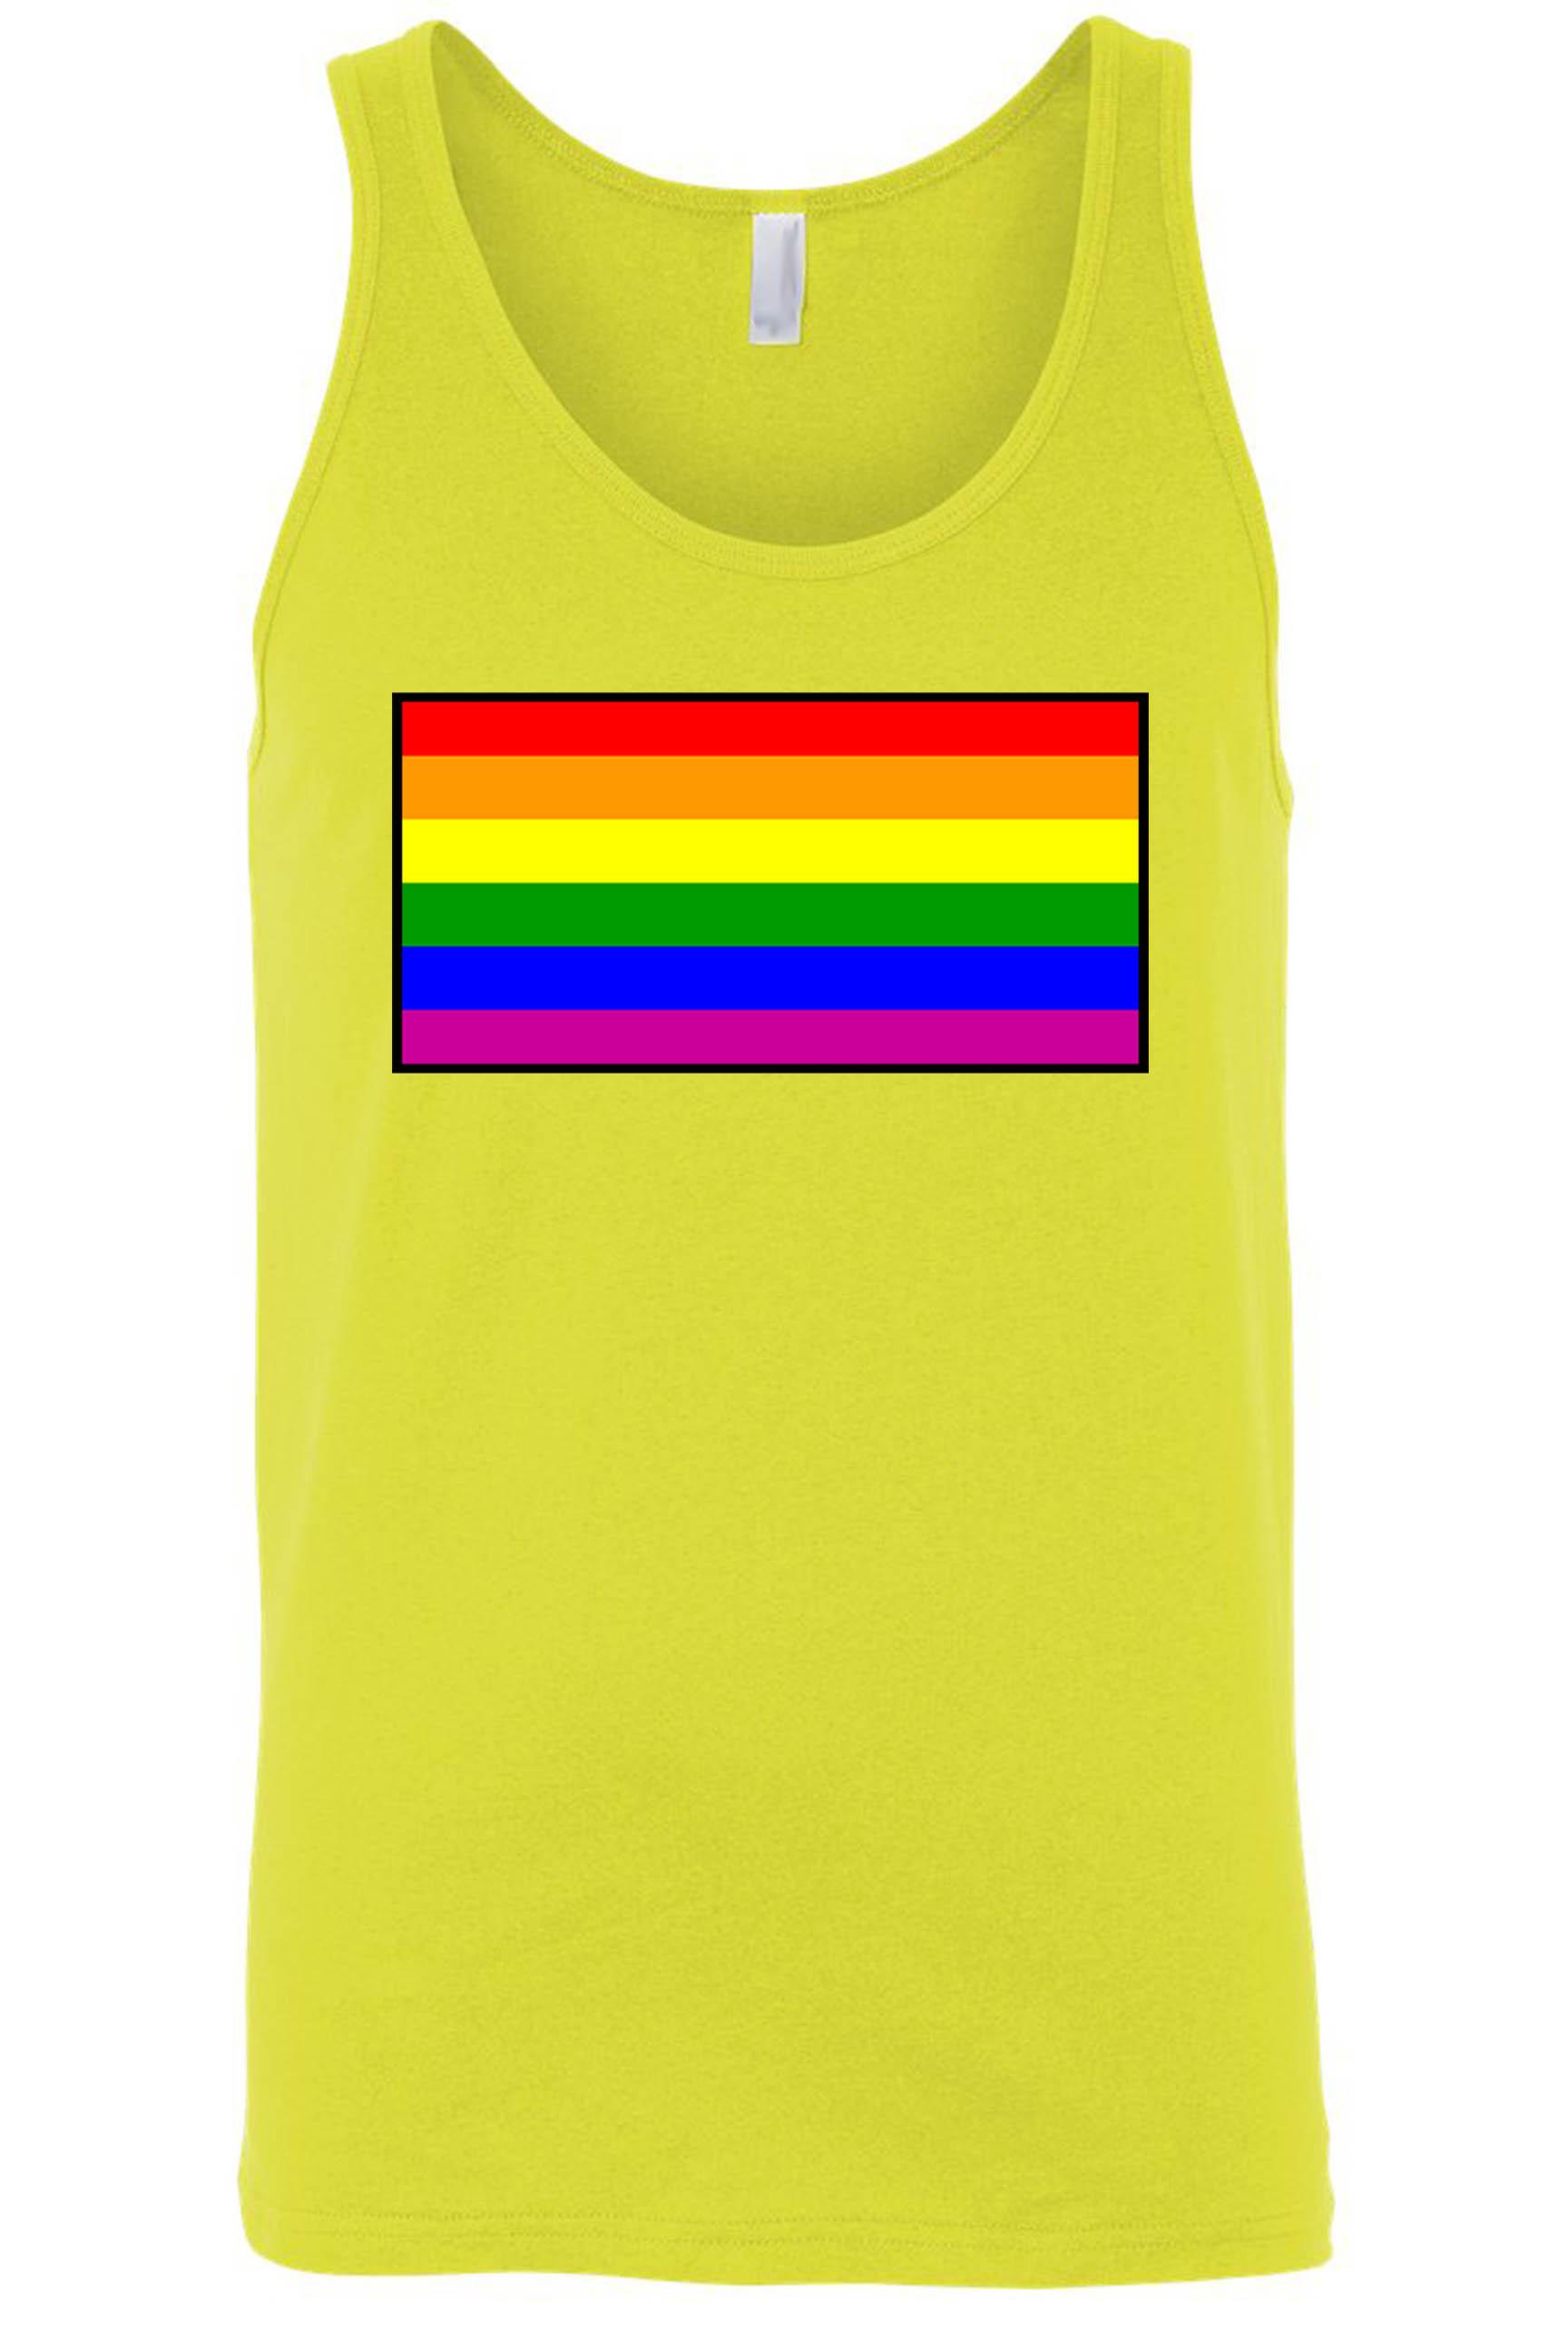 Men's Tank Top Shirt Gay Pride Rainbow Flag